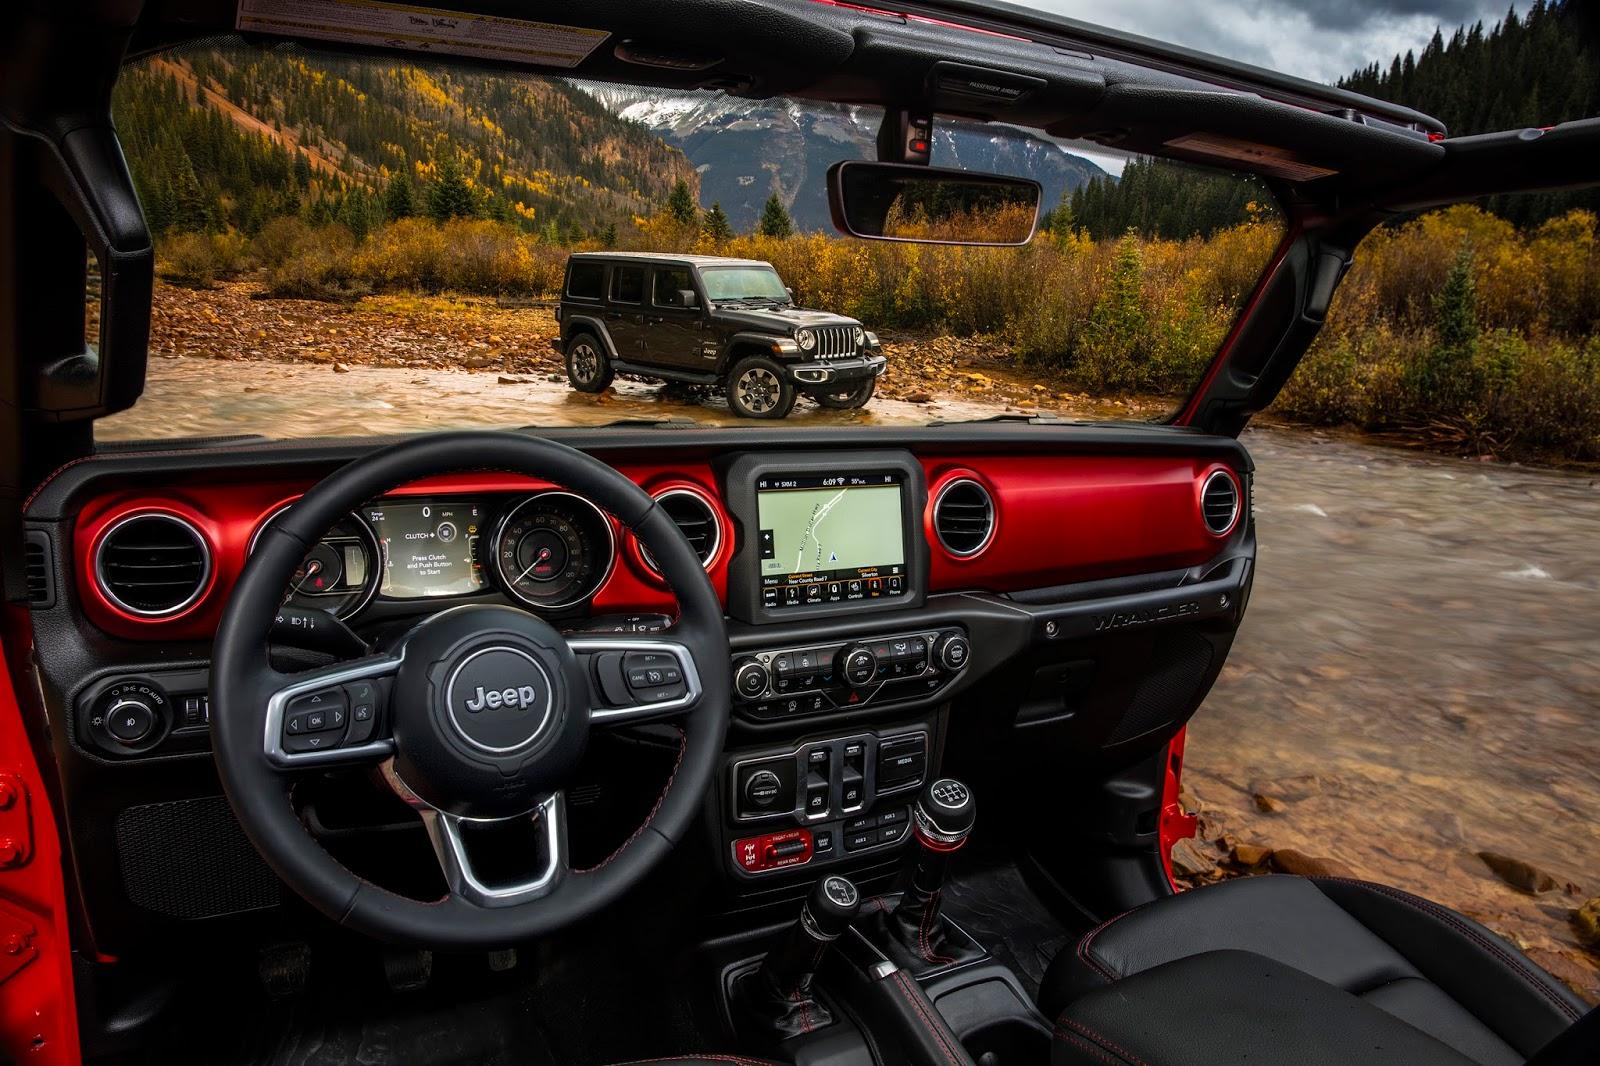 New Pics Next Generation 2018 Jeep Wrangler Powertrain